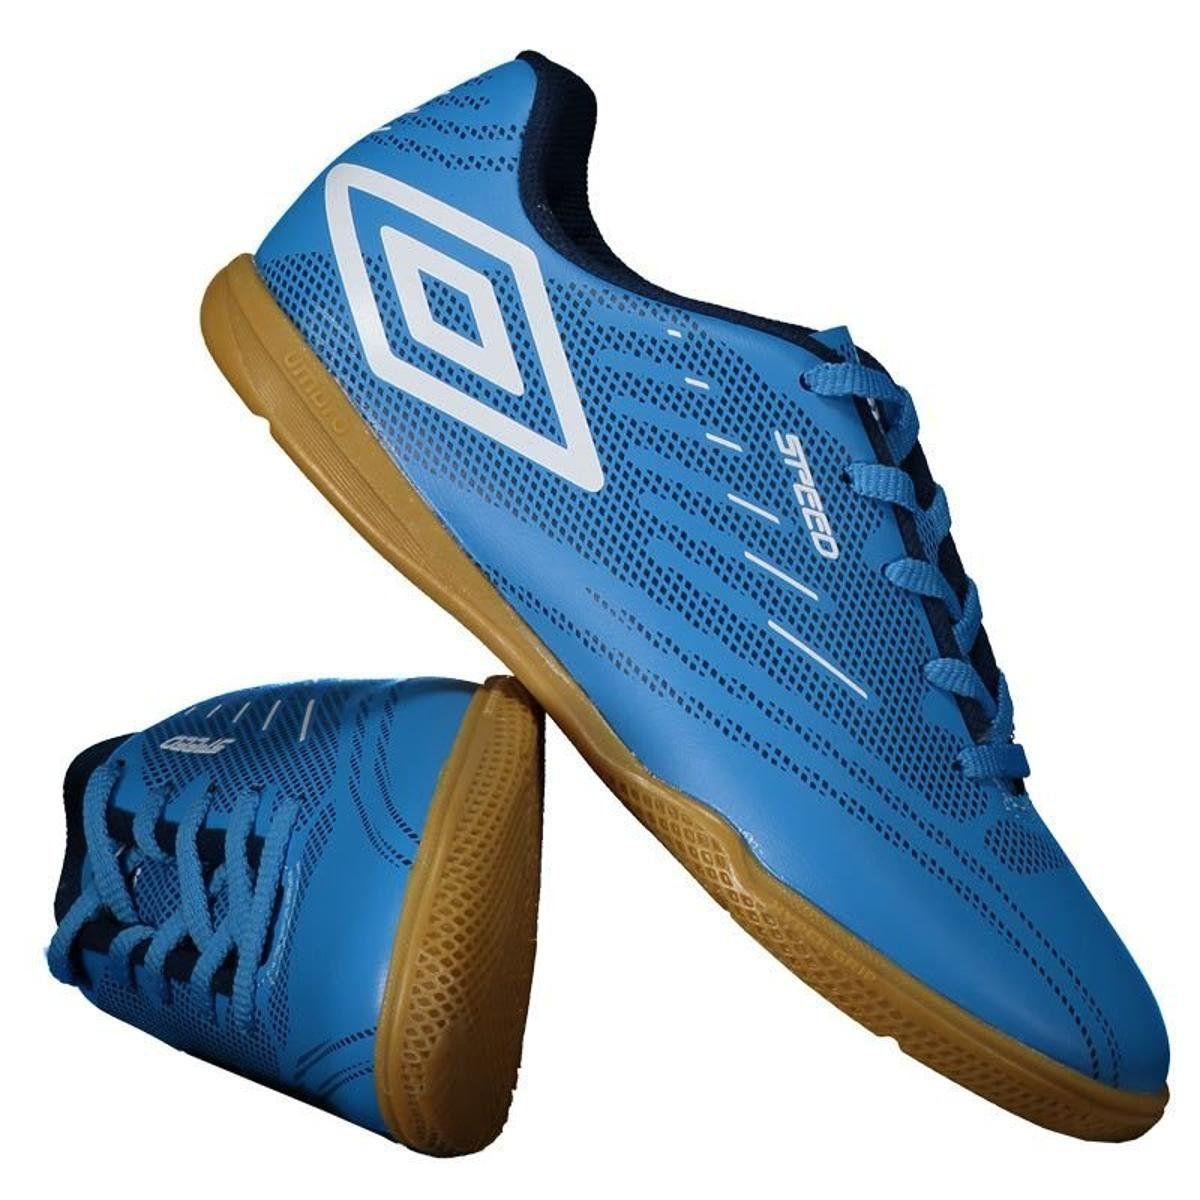 Chuteira Futsal Umbro Speed IV Jr - Juvenil - Azul